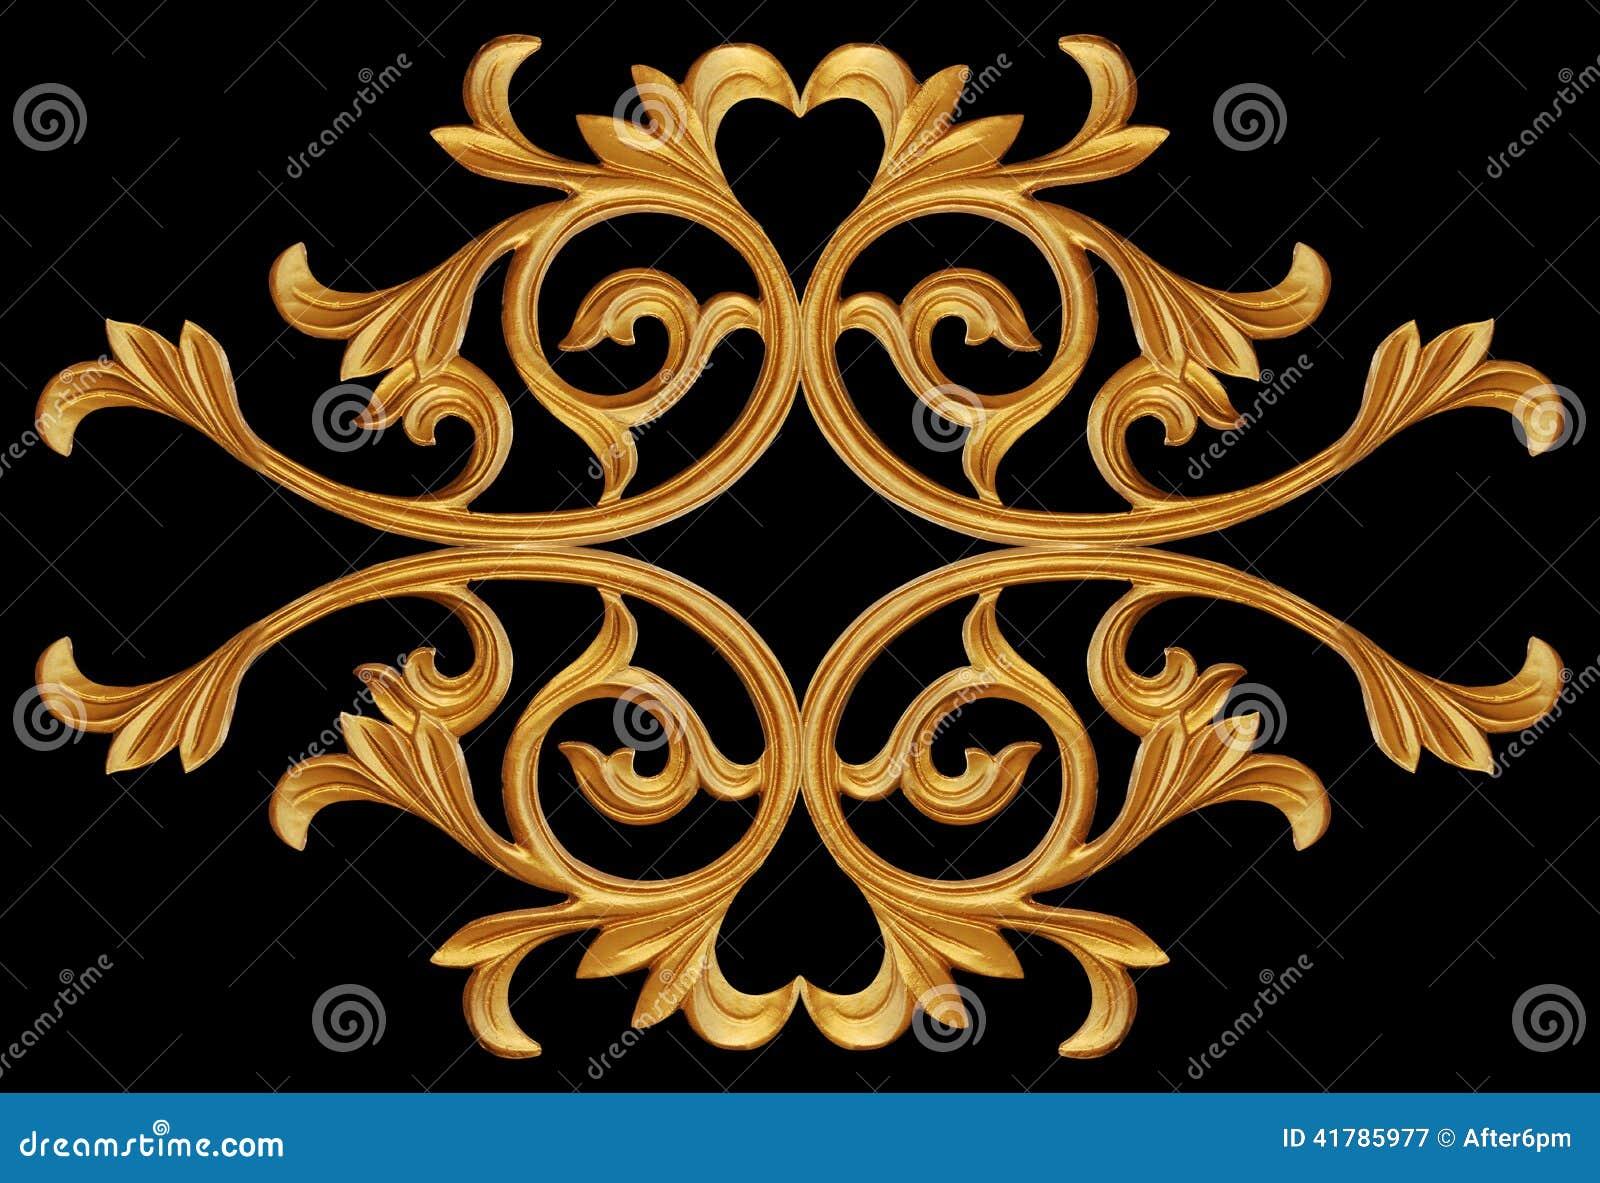 Elementos do ornamento, designs florais do ouro do vintage